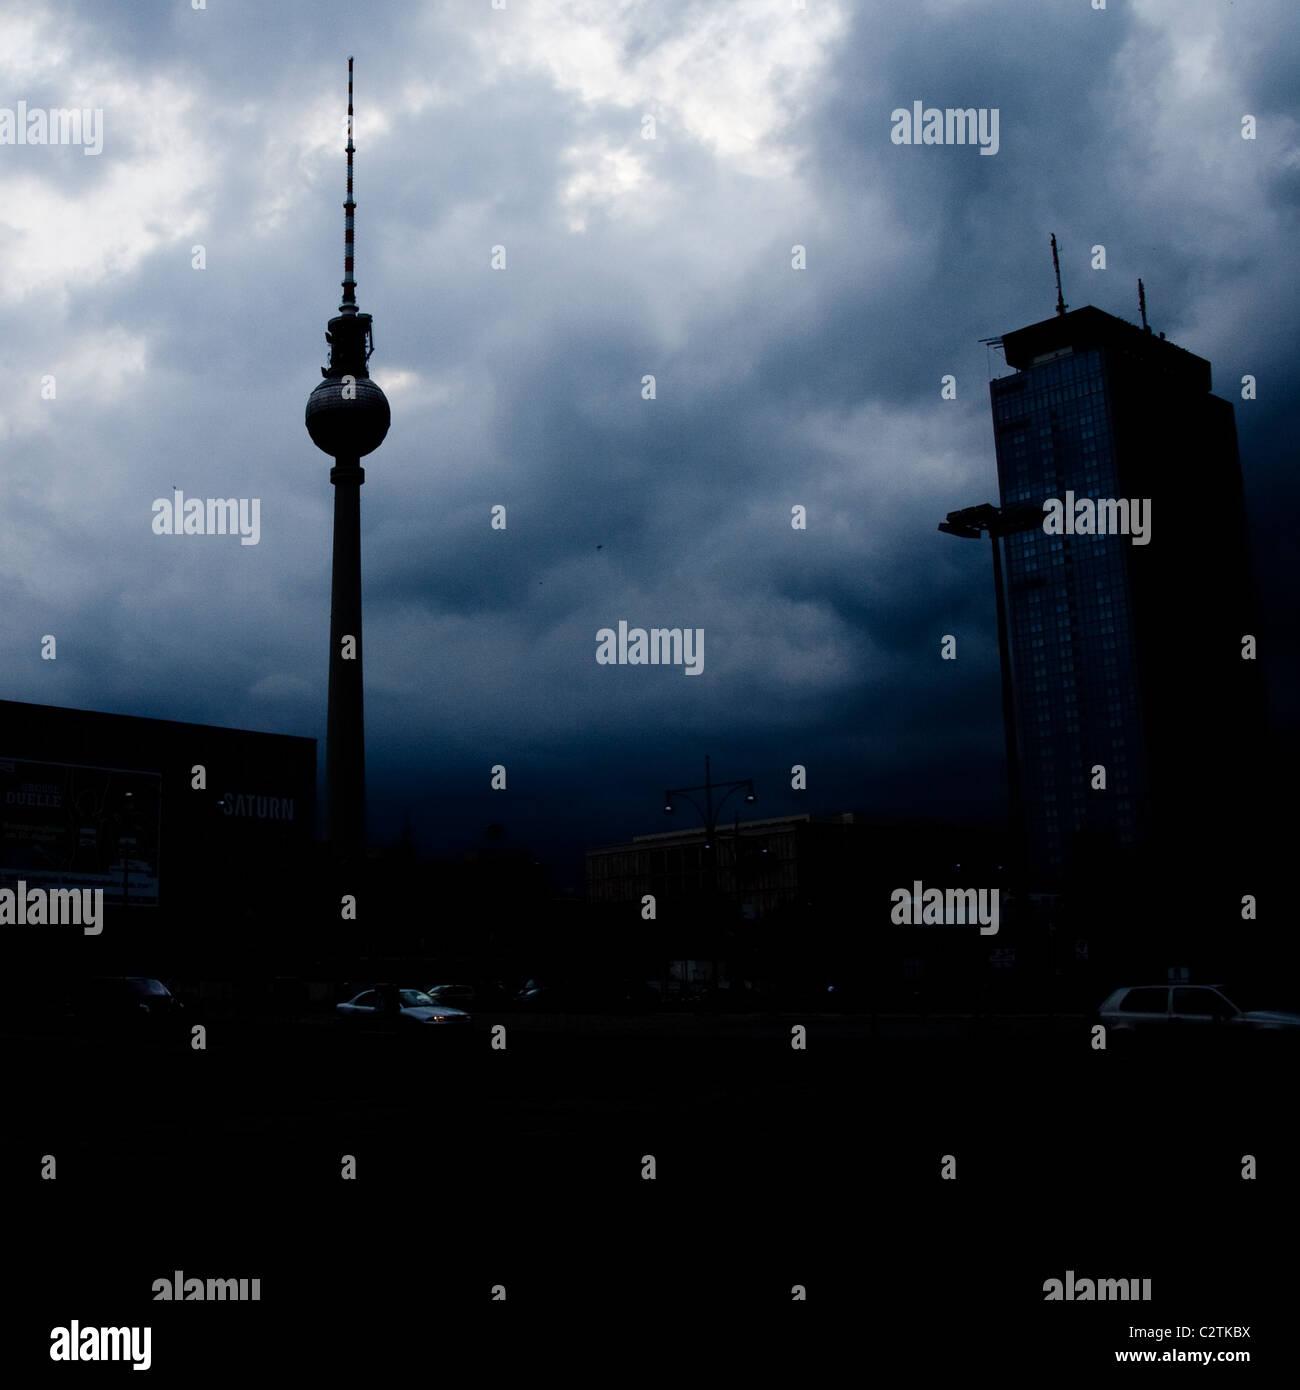 Dark skies around the TV tower at alexanderplatz in Berlin - Stock Image